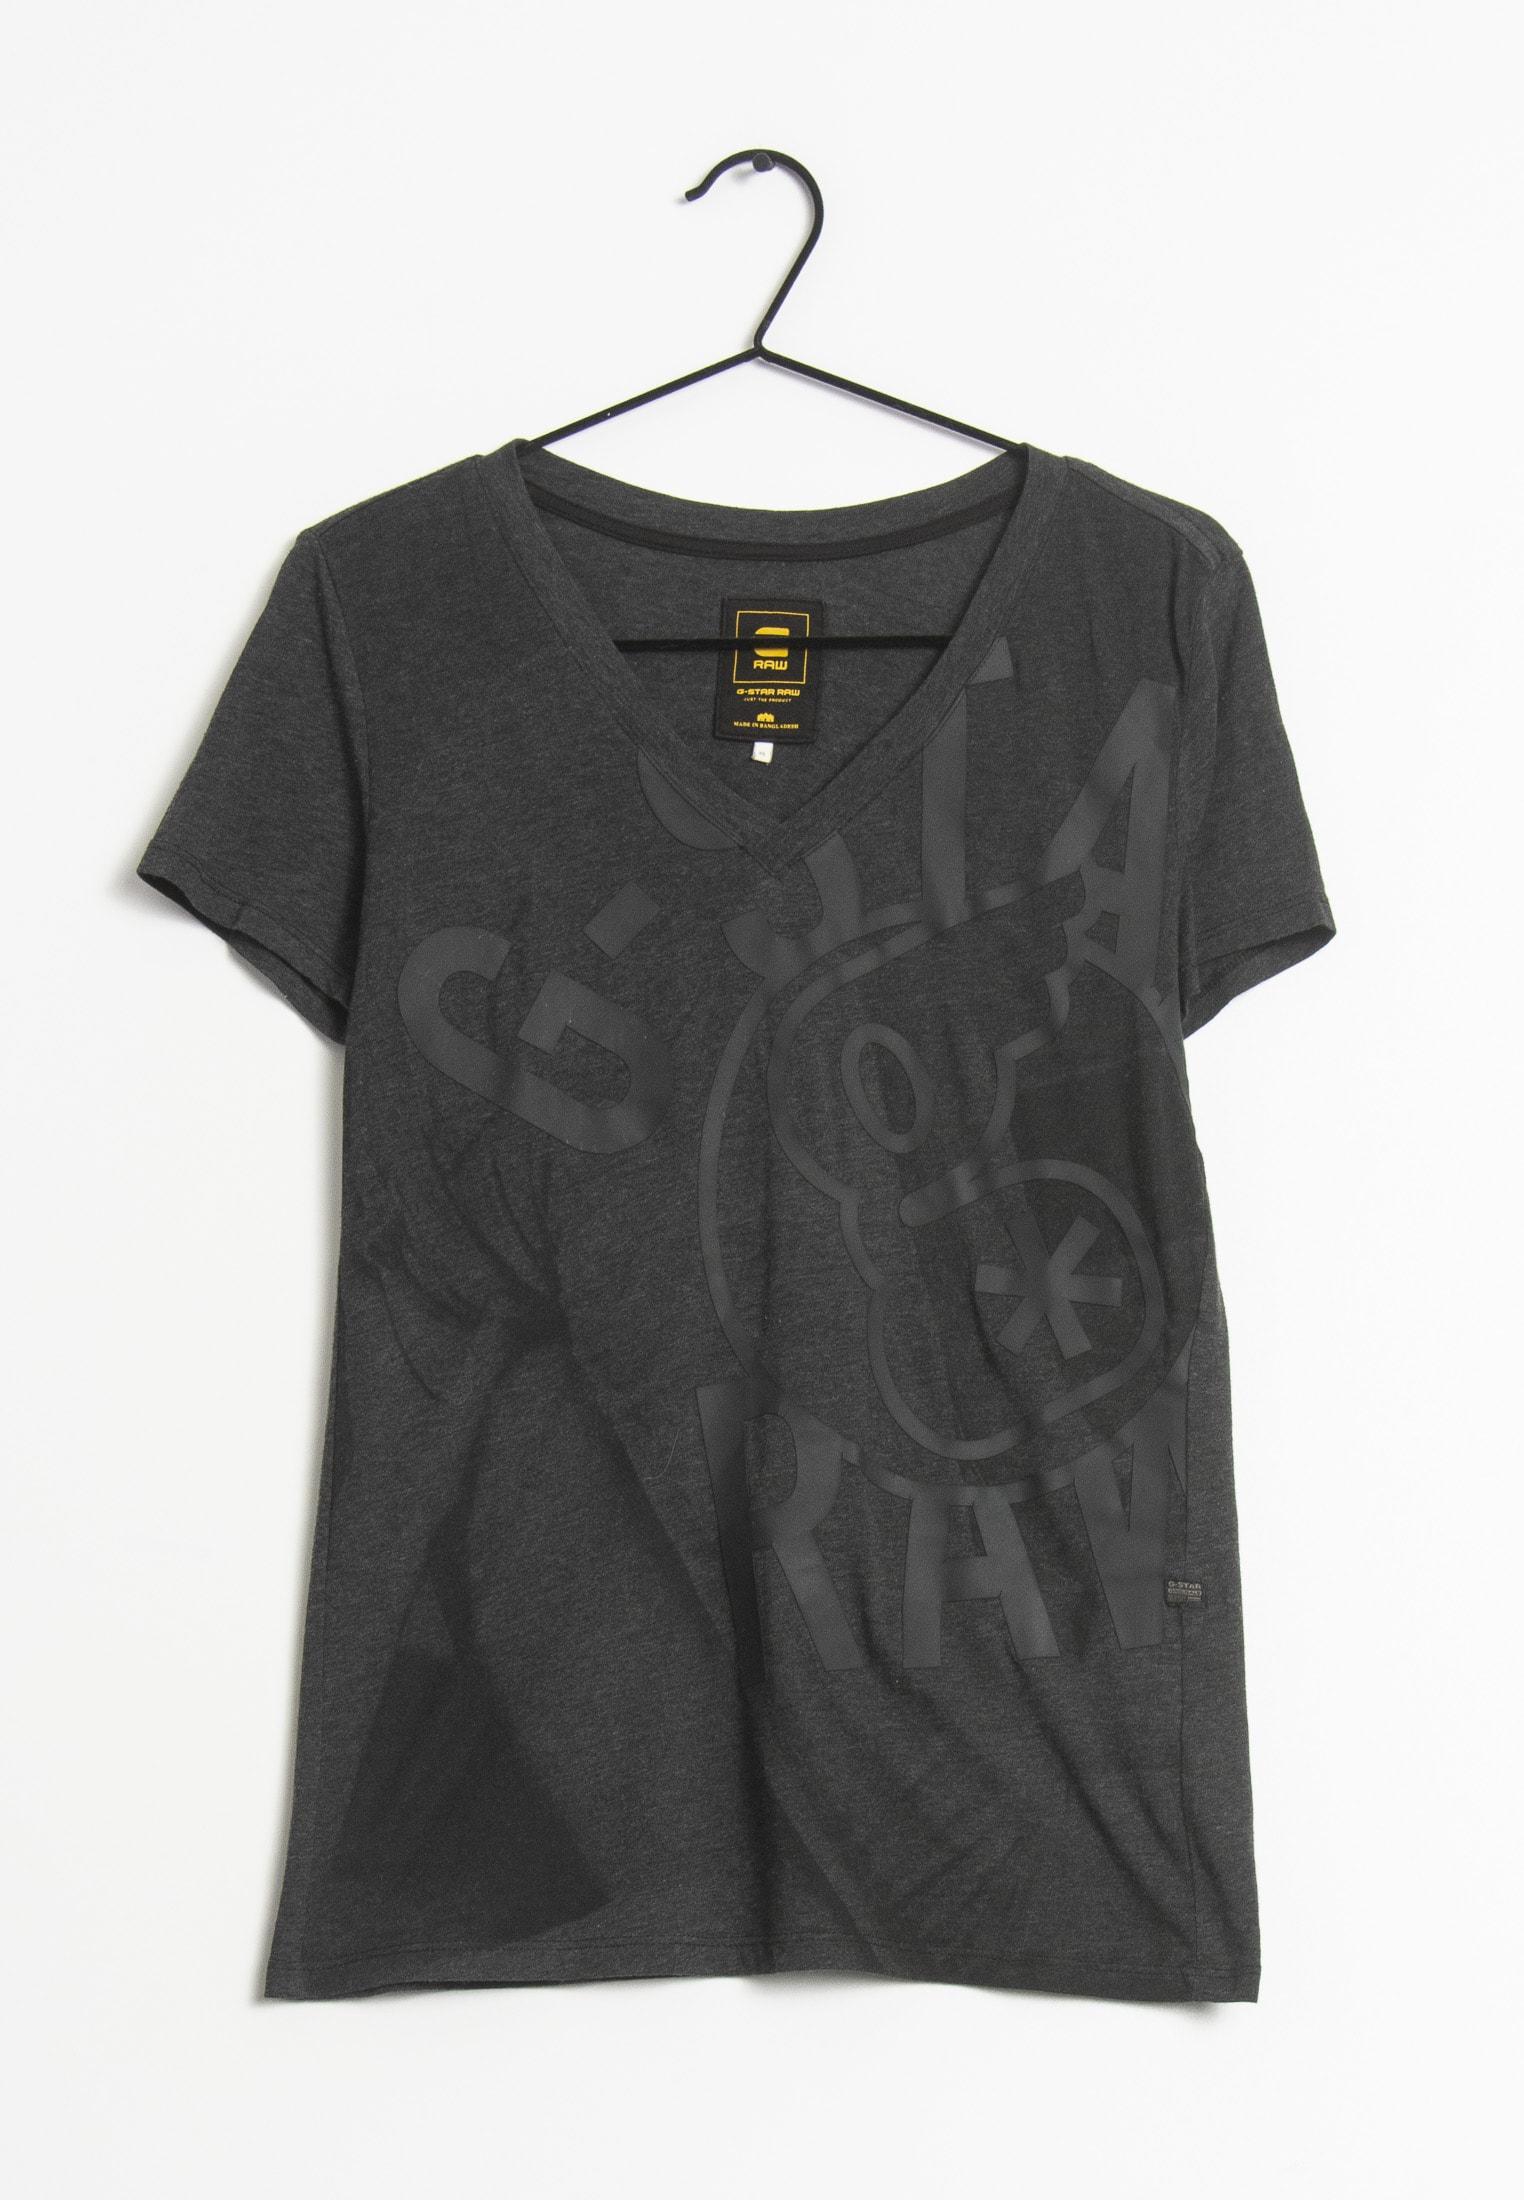 G-Star T-Shirt Grau Gr.XS